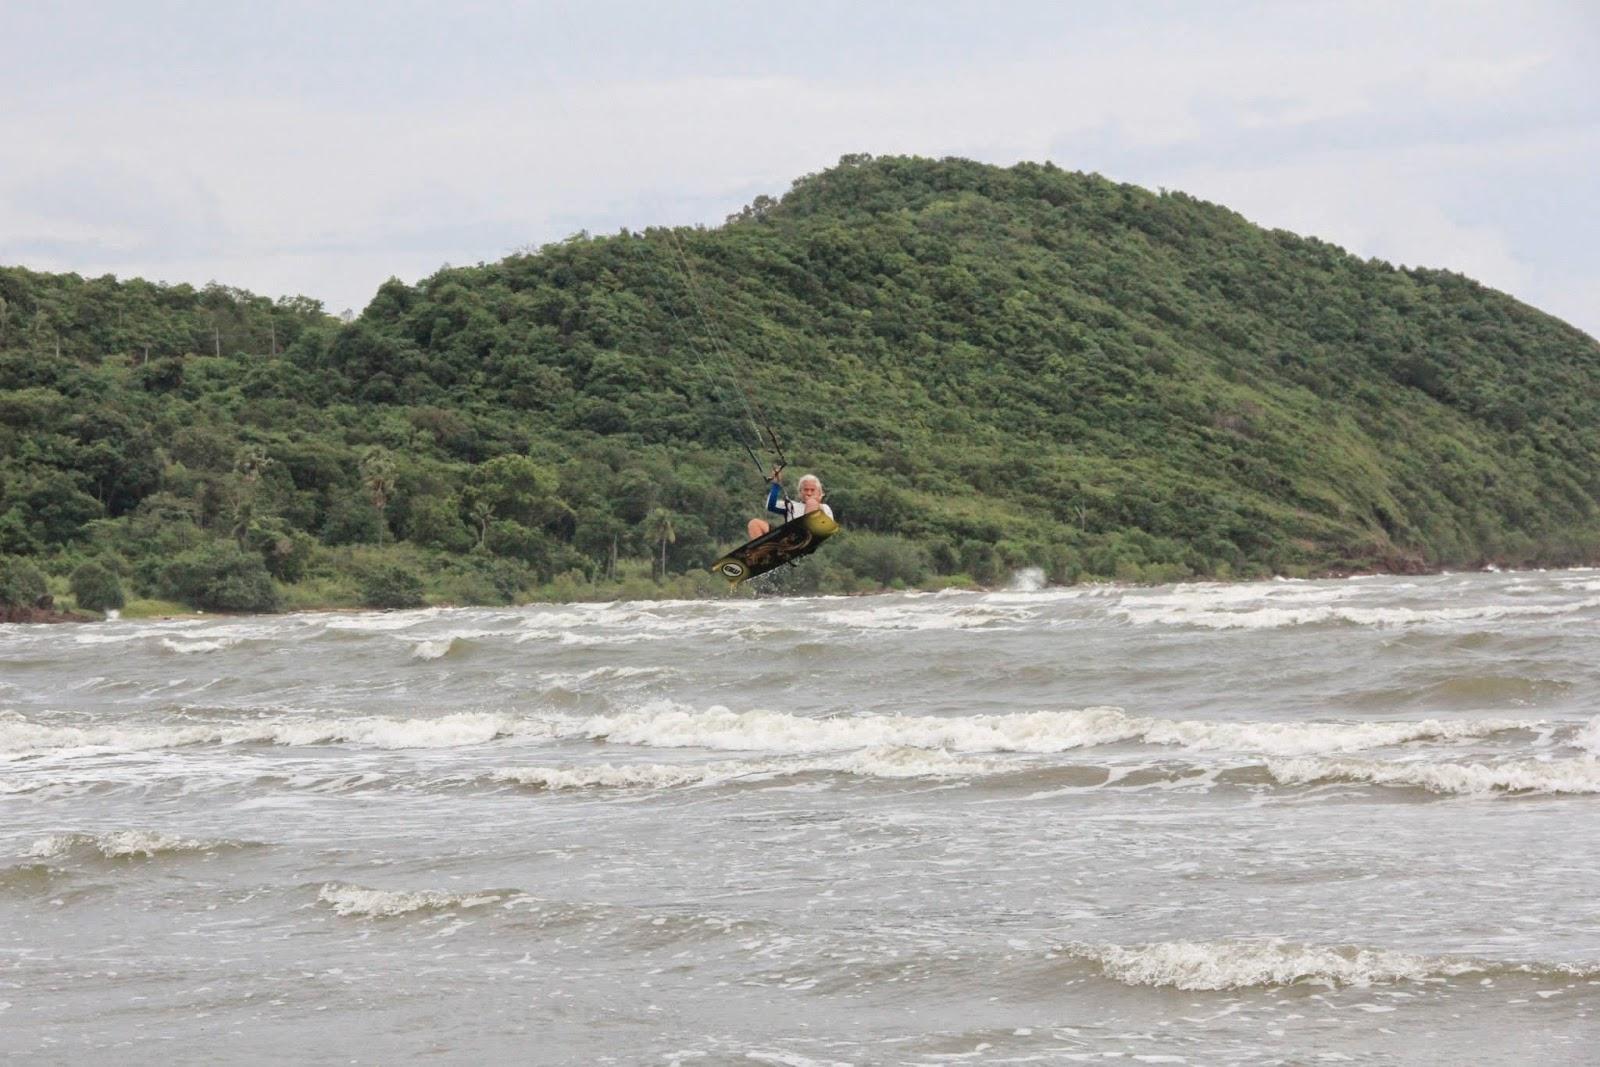 Kite Surfer in Pak Meng, Trang - Thailand